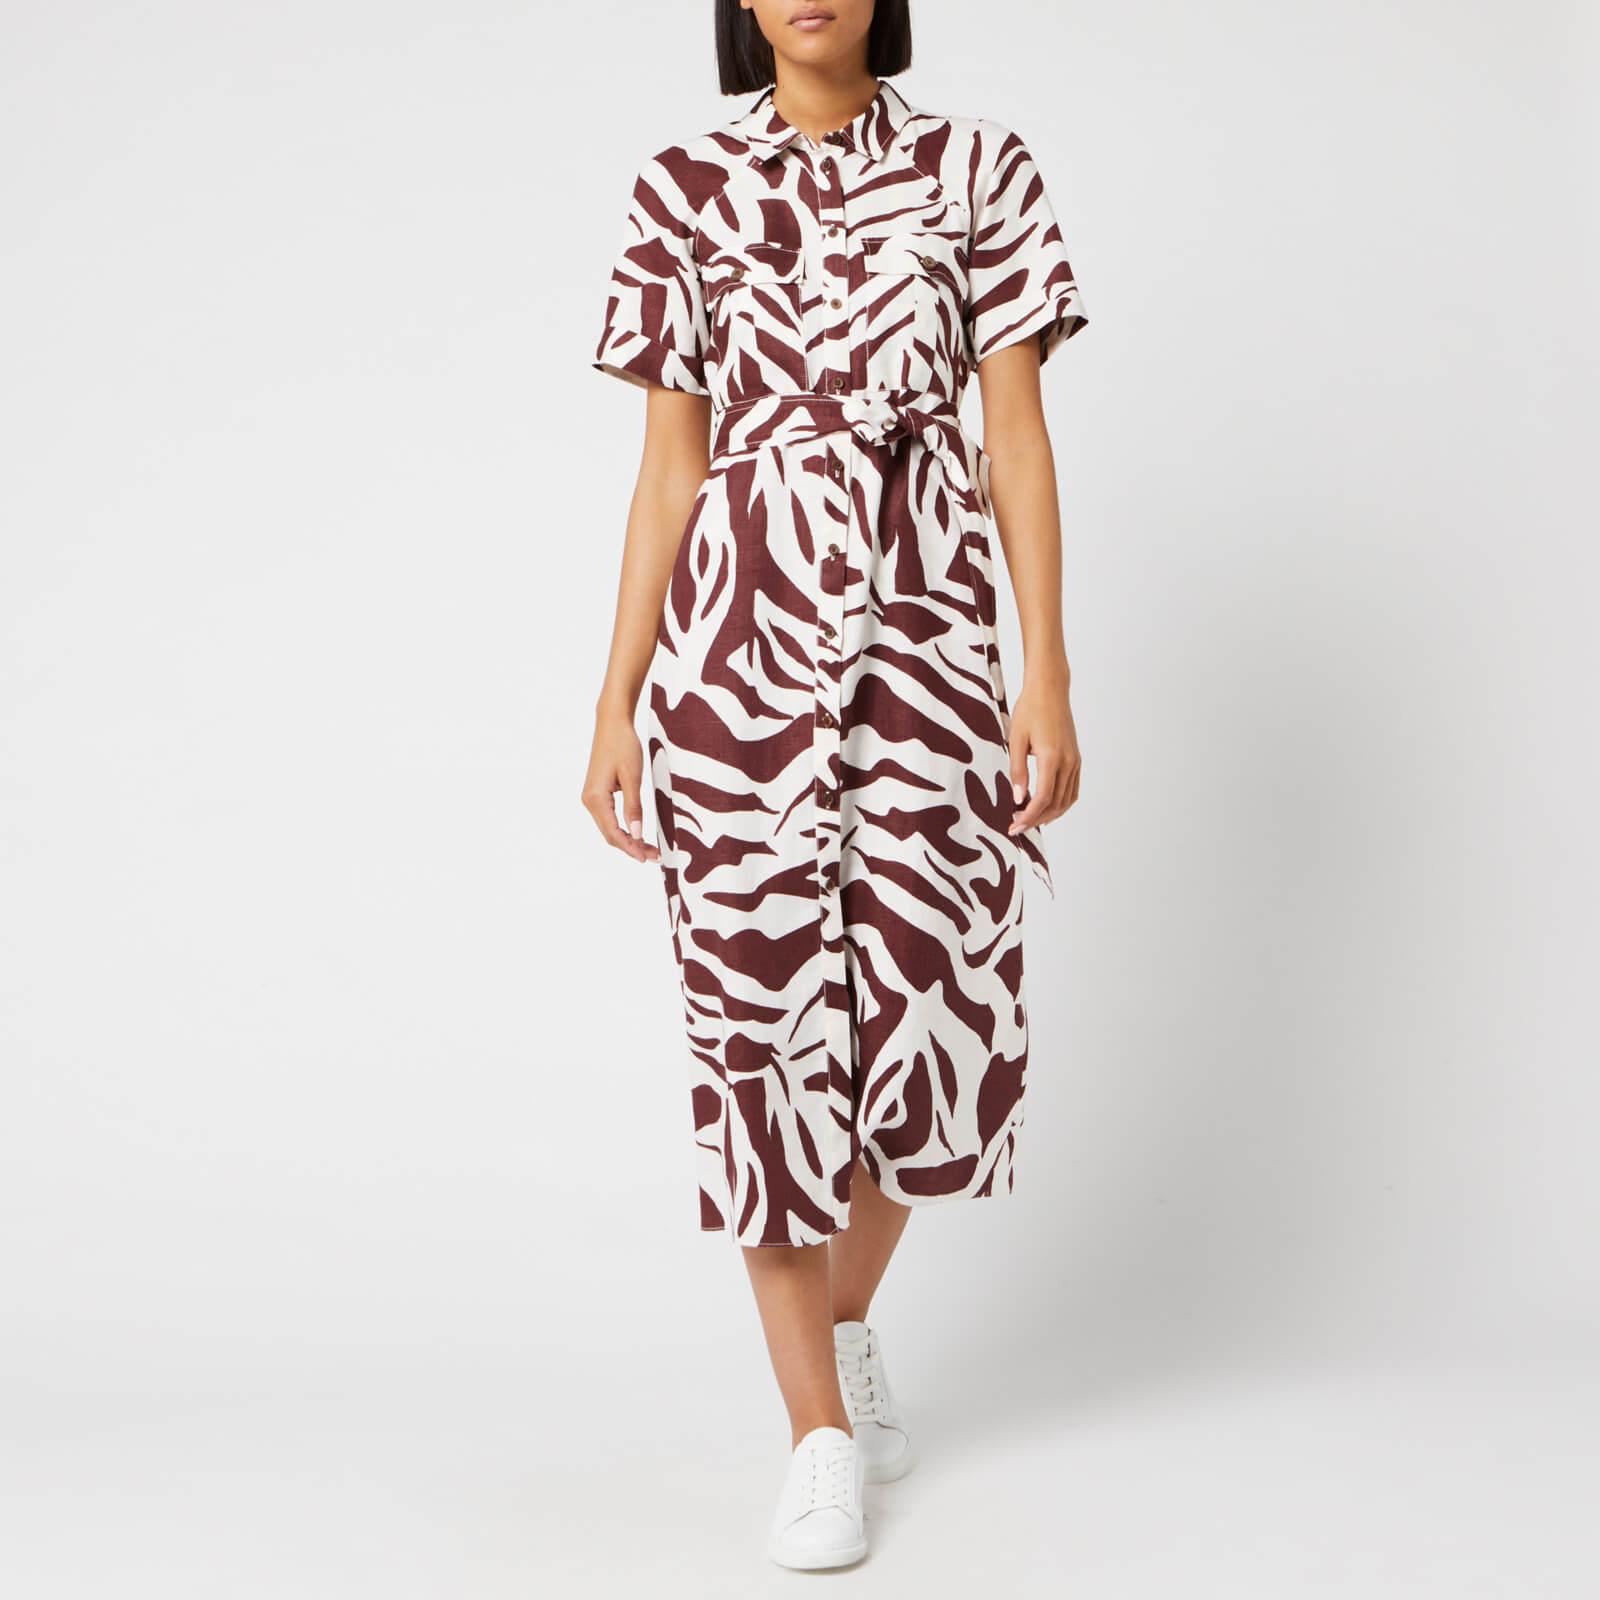 Whistles Women's Graphic Zebra Shirt Dress - Brown/Multi - UK 12 - Multi